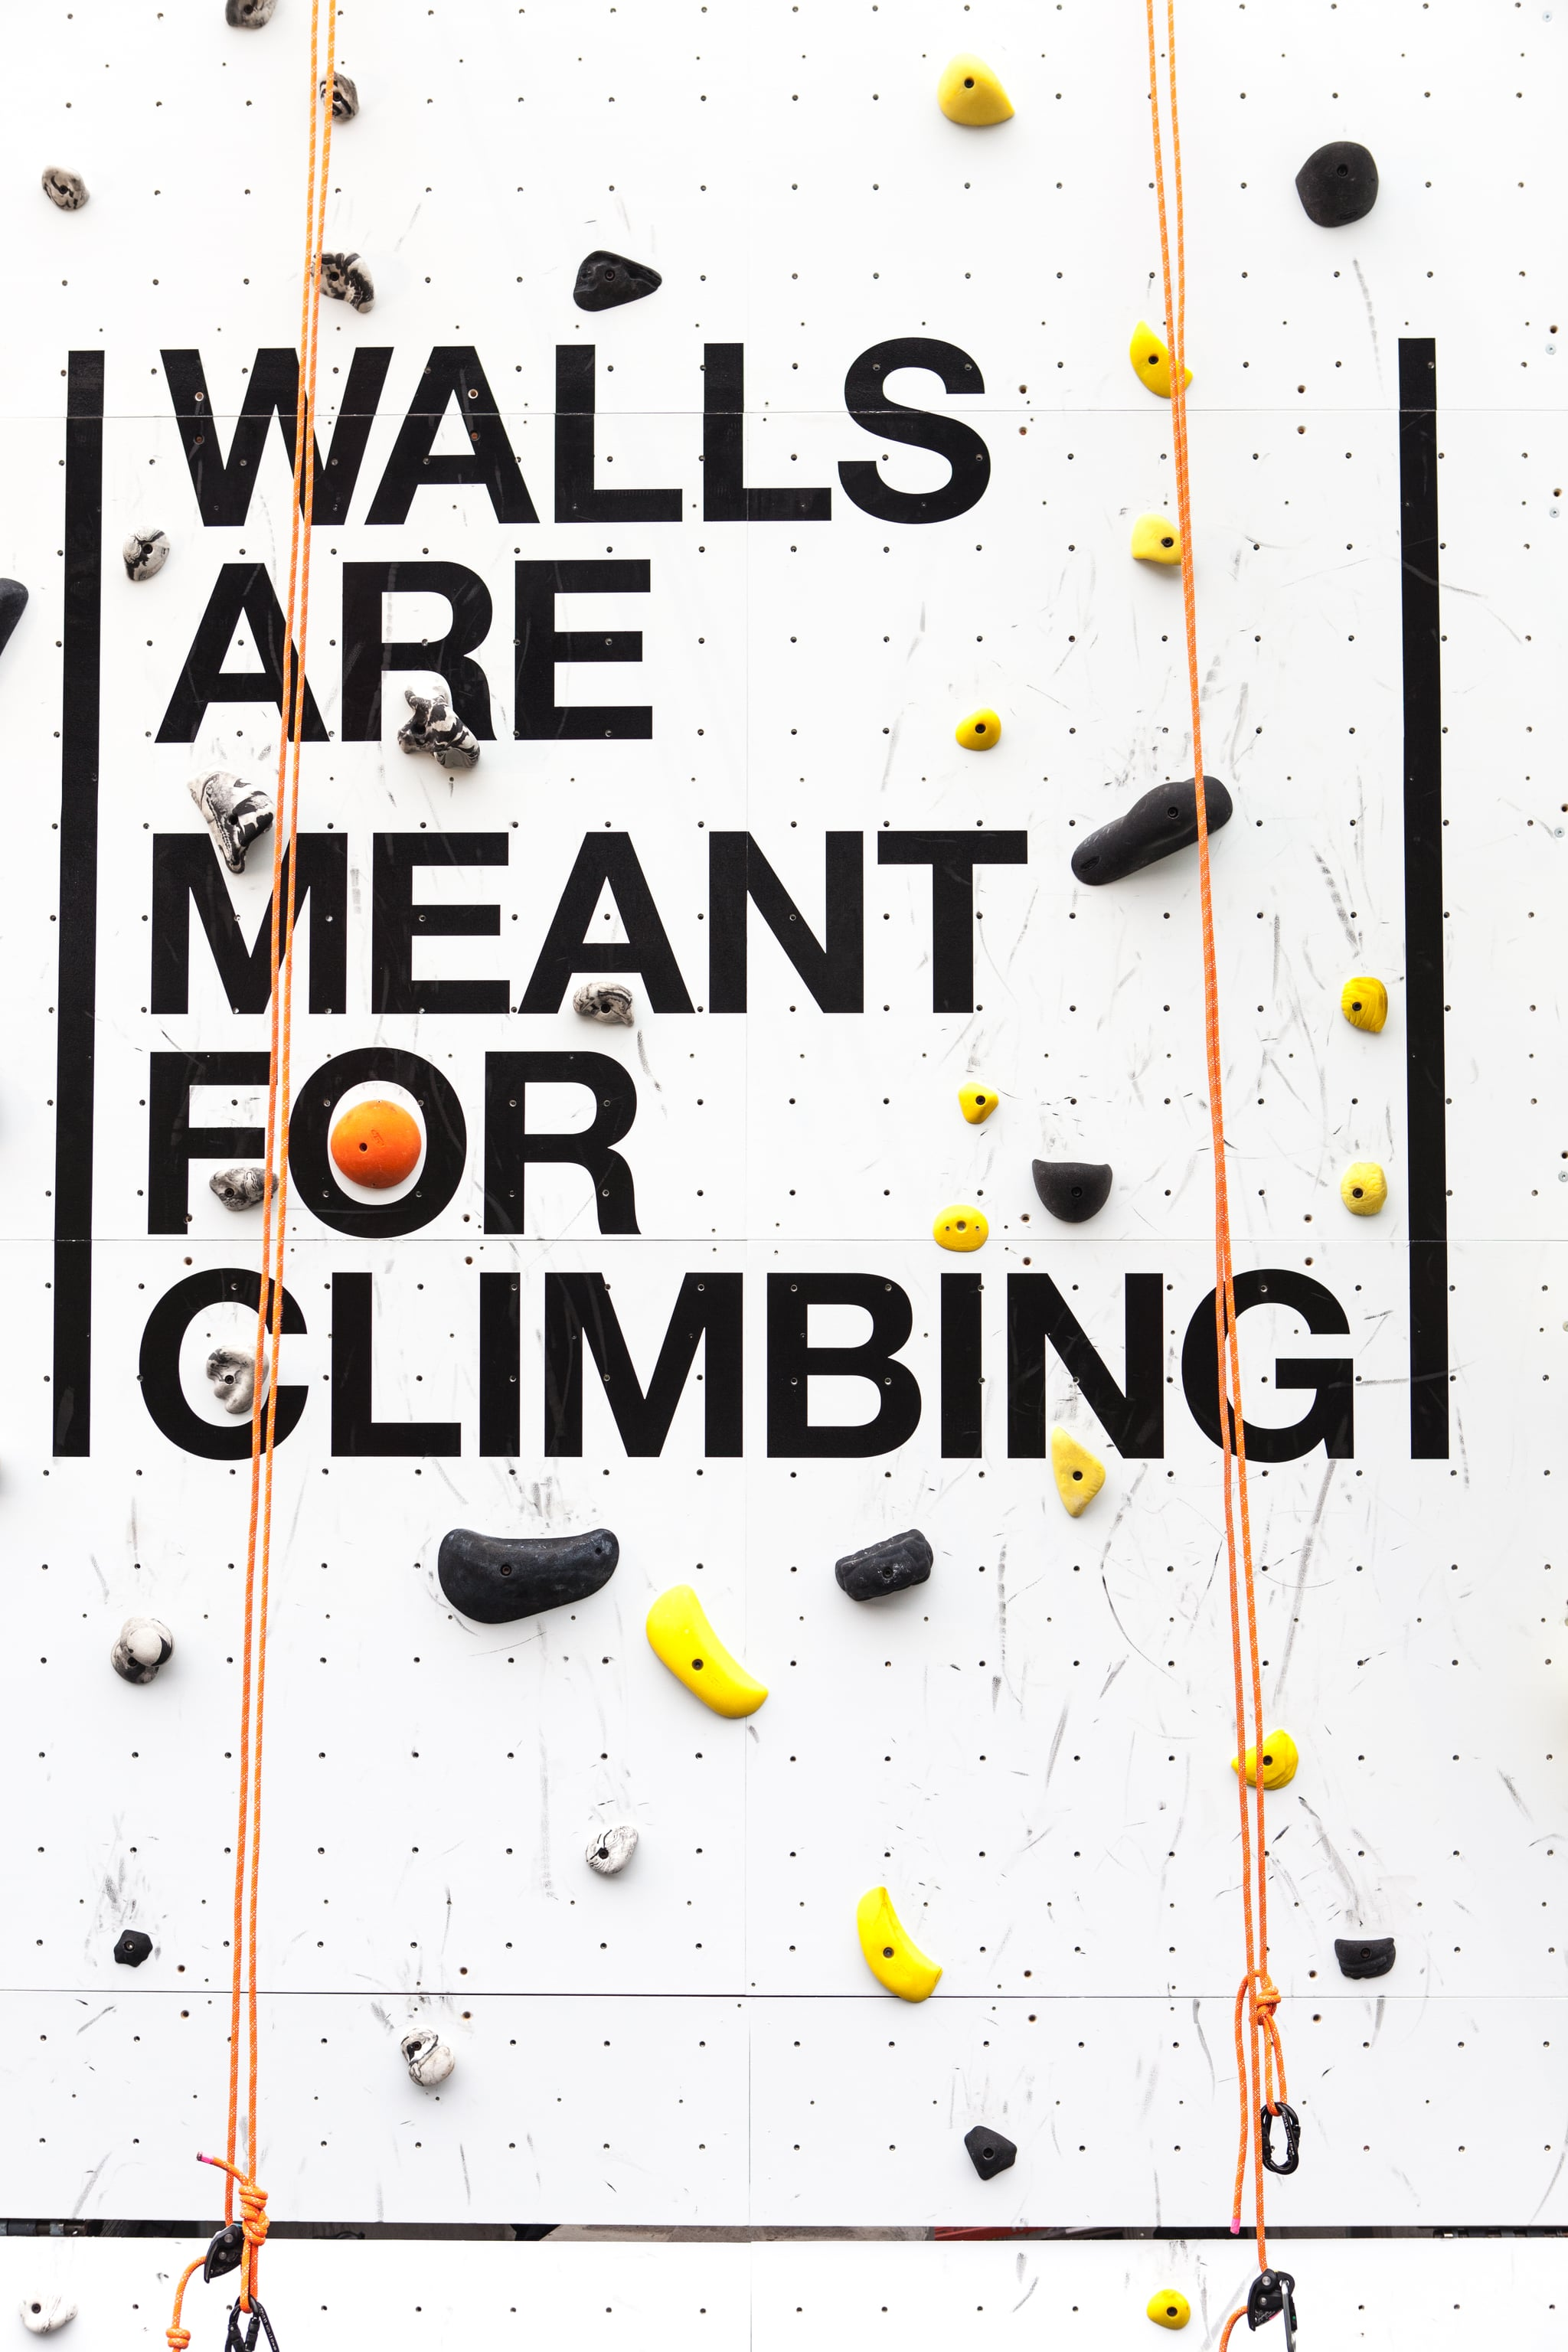 North Face Wall Climbing Campaign Popsugar News